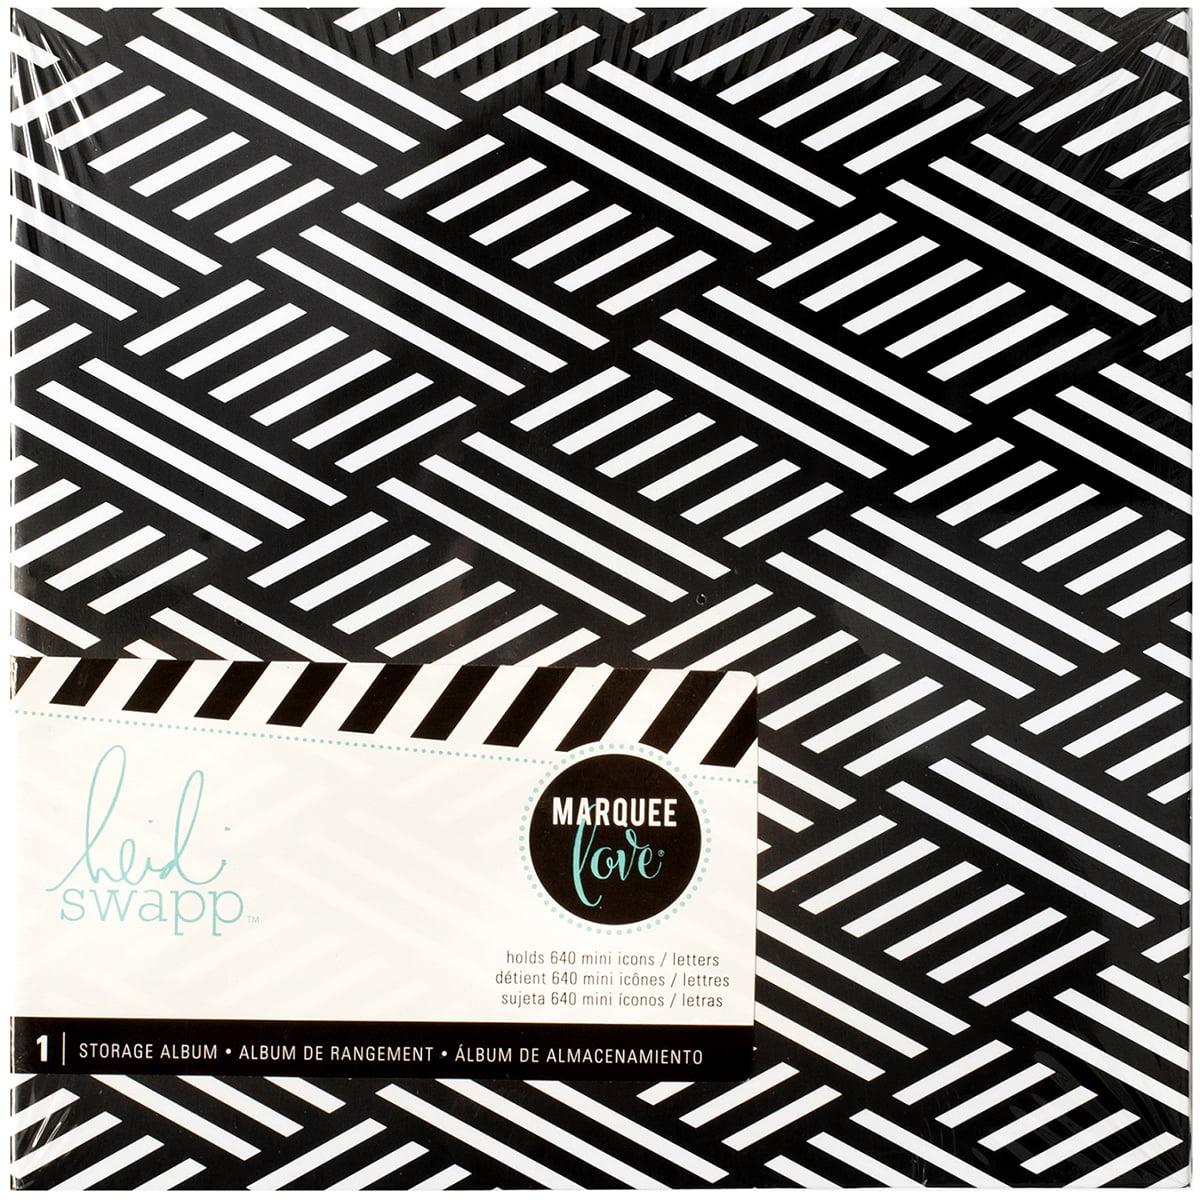 """Heidi Swapp Lightbo x  Mini Insert Storage Album 6.5"""" x 6.5"""" - Black & White, Holds 640 Mini Icons"" HS315037"